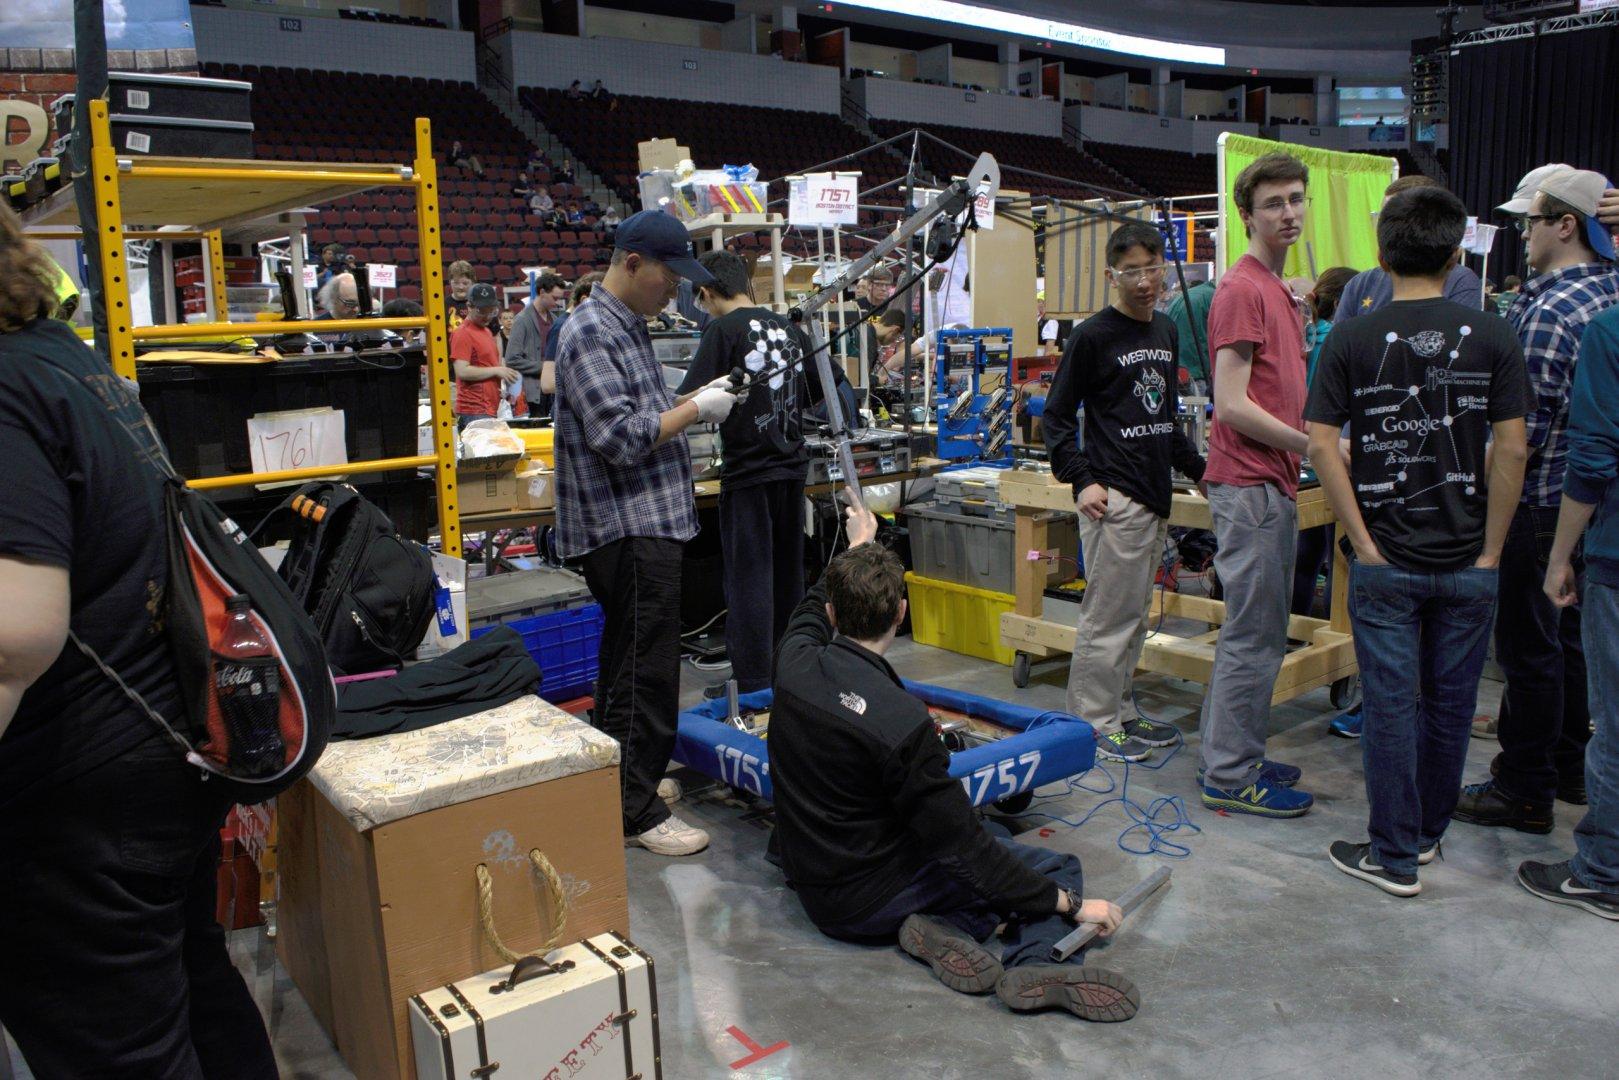 021.Boston FIRST Robotics Competition 04-03-2016.jpg